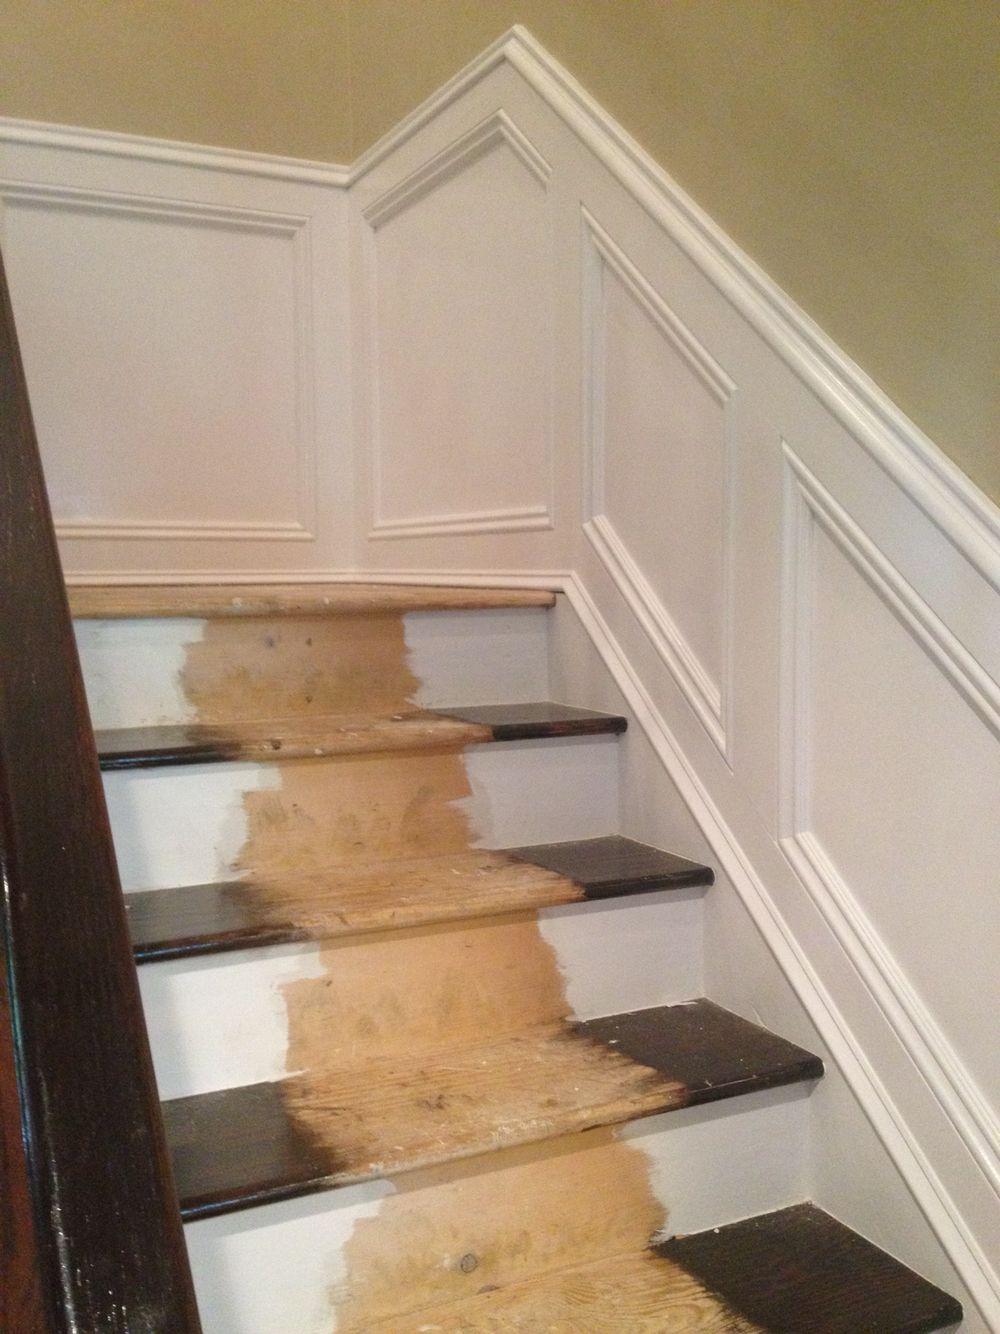 Stairway Updating House Wainscoting Wainscoting Stairs